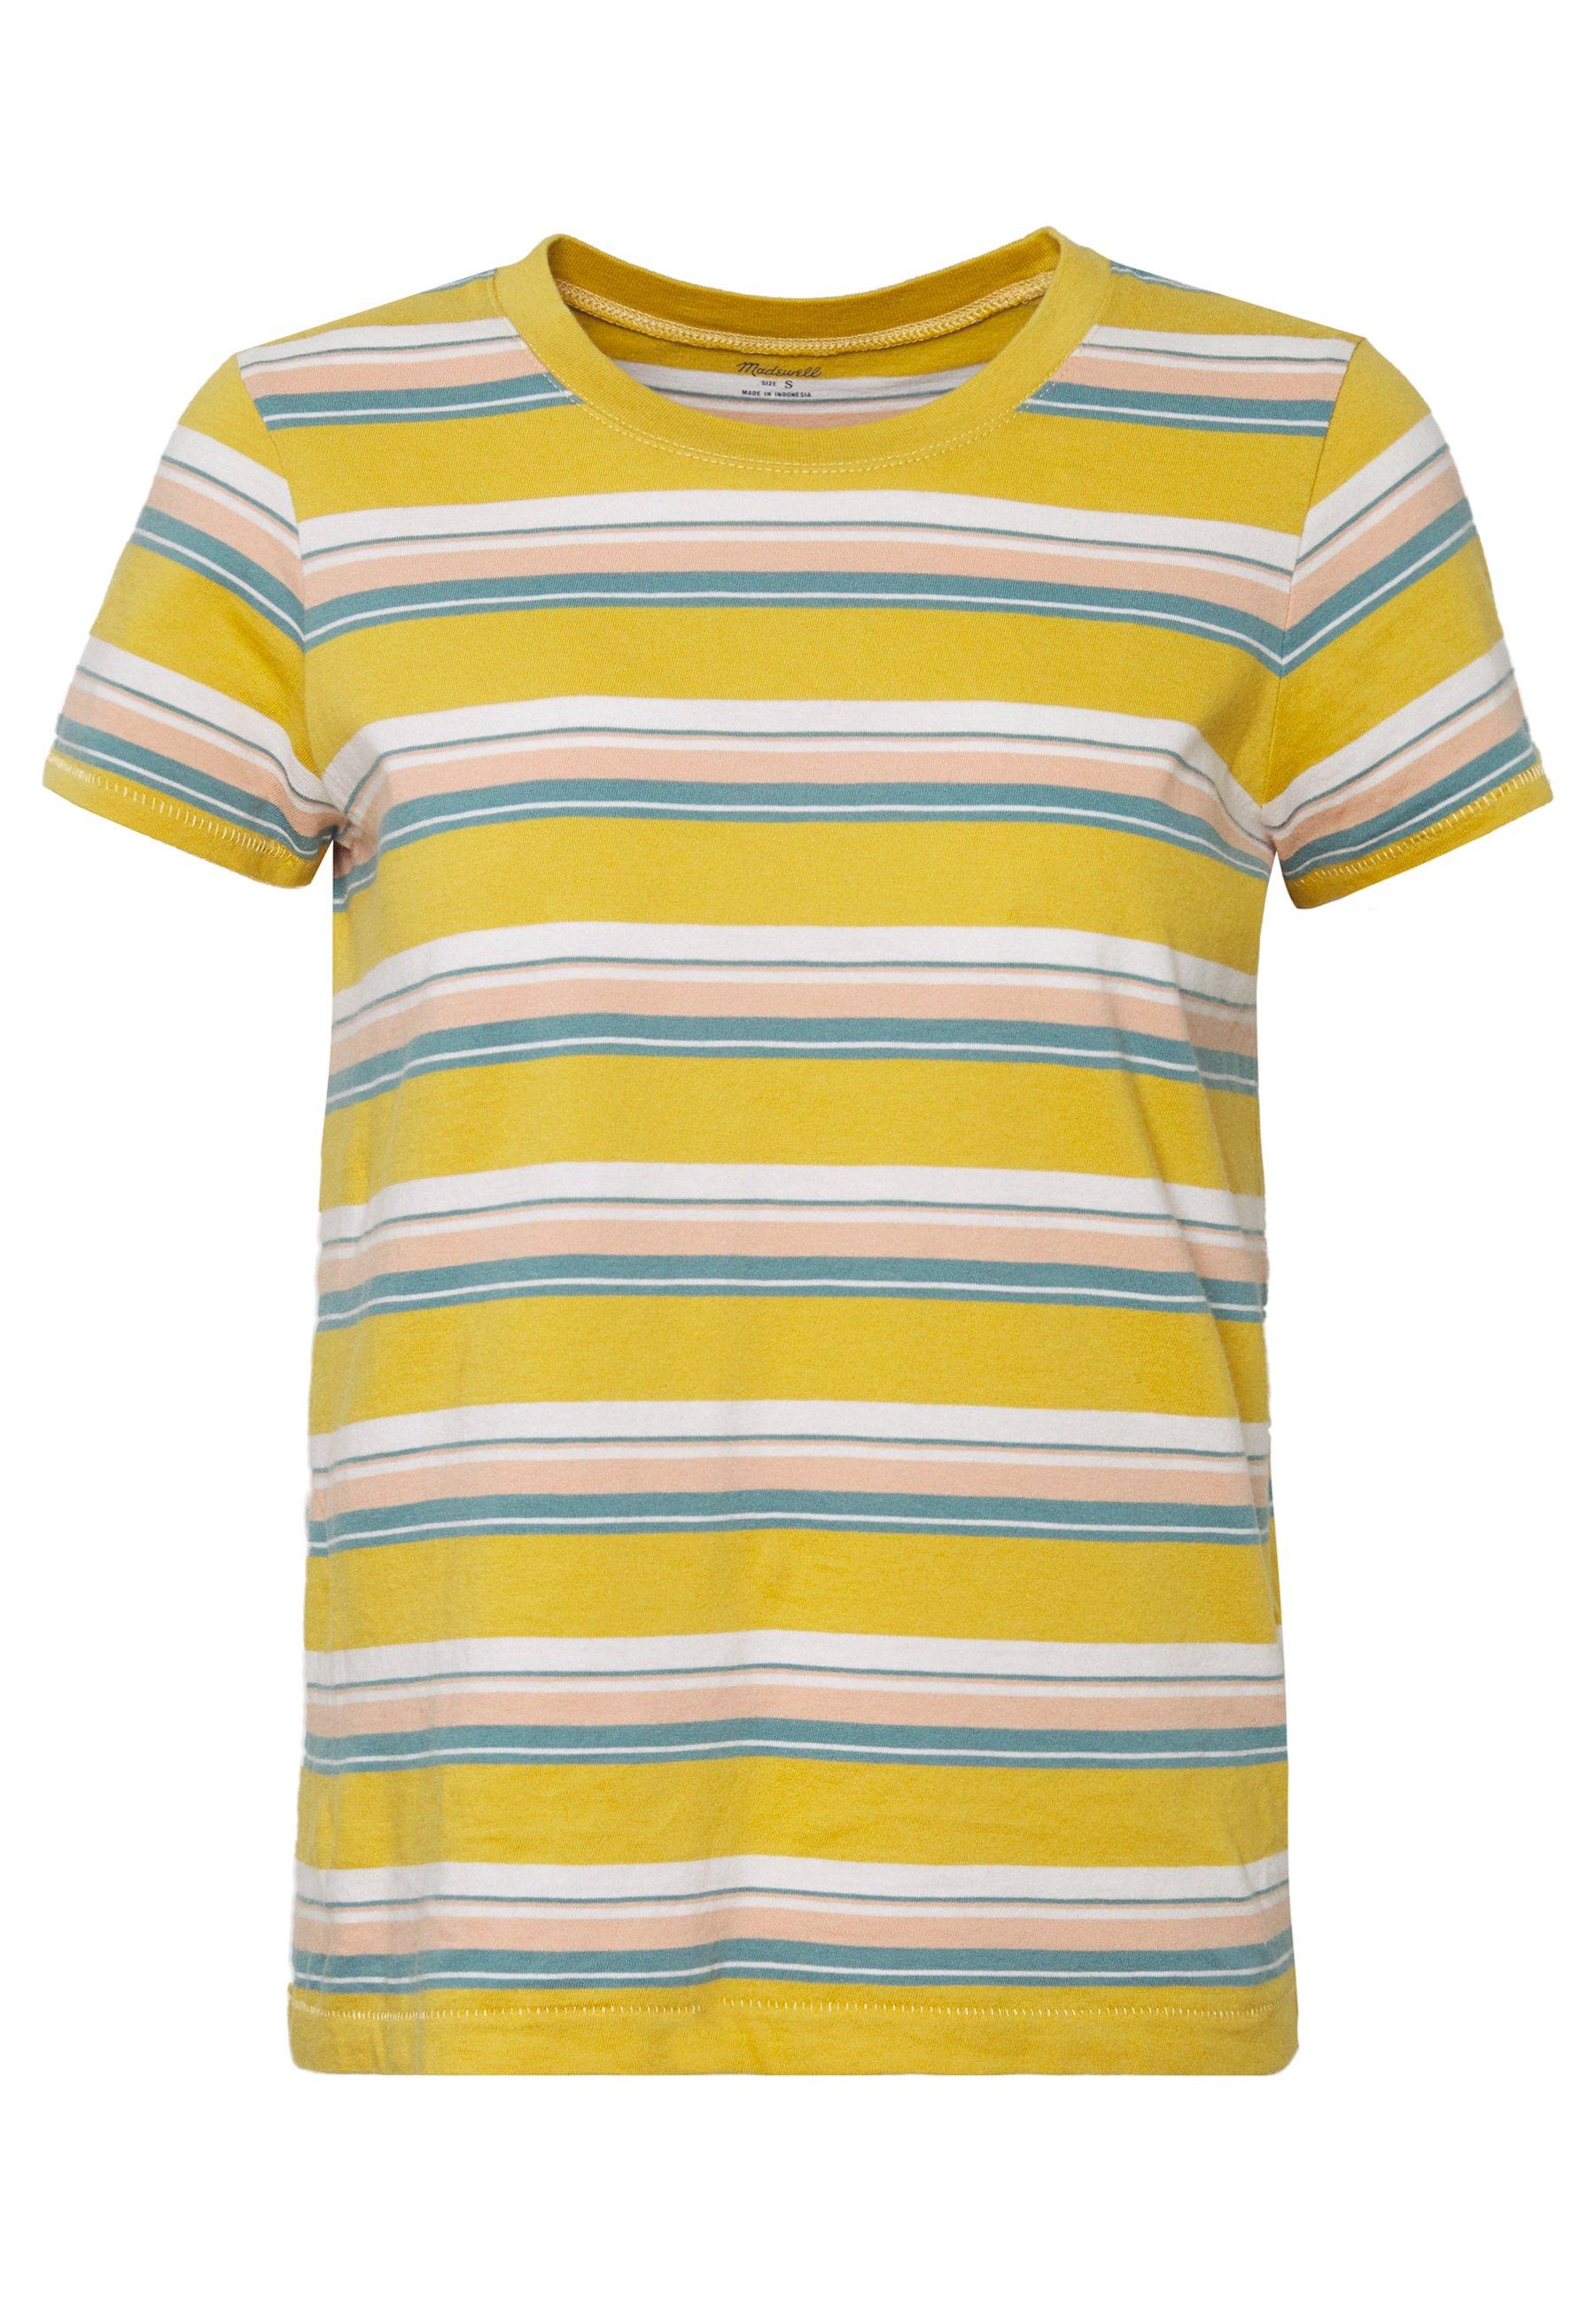 Madewell Northside Vintage Tee In Puer Stripe - Print T-shirt Greek Gold